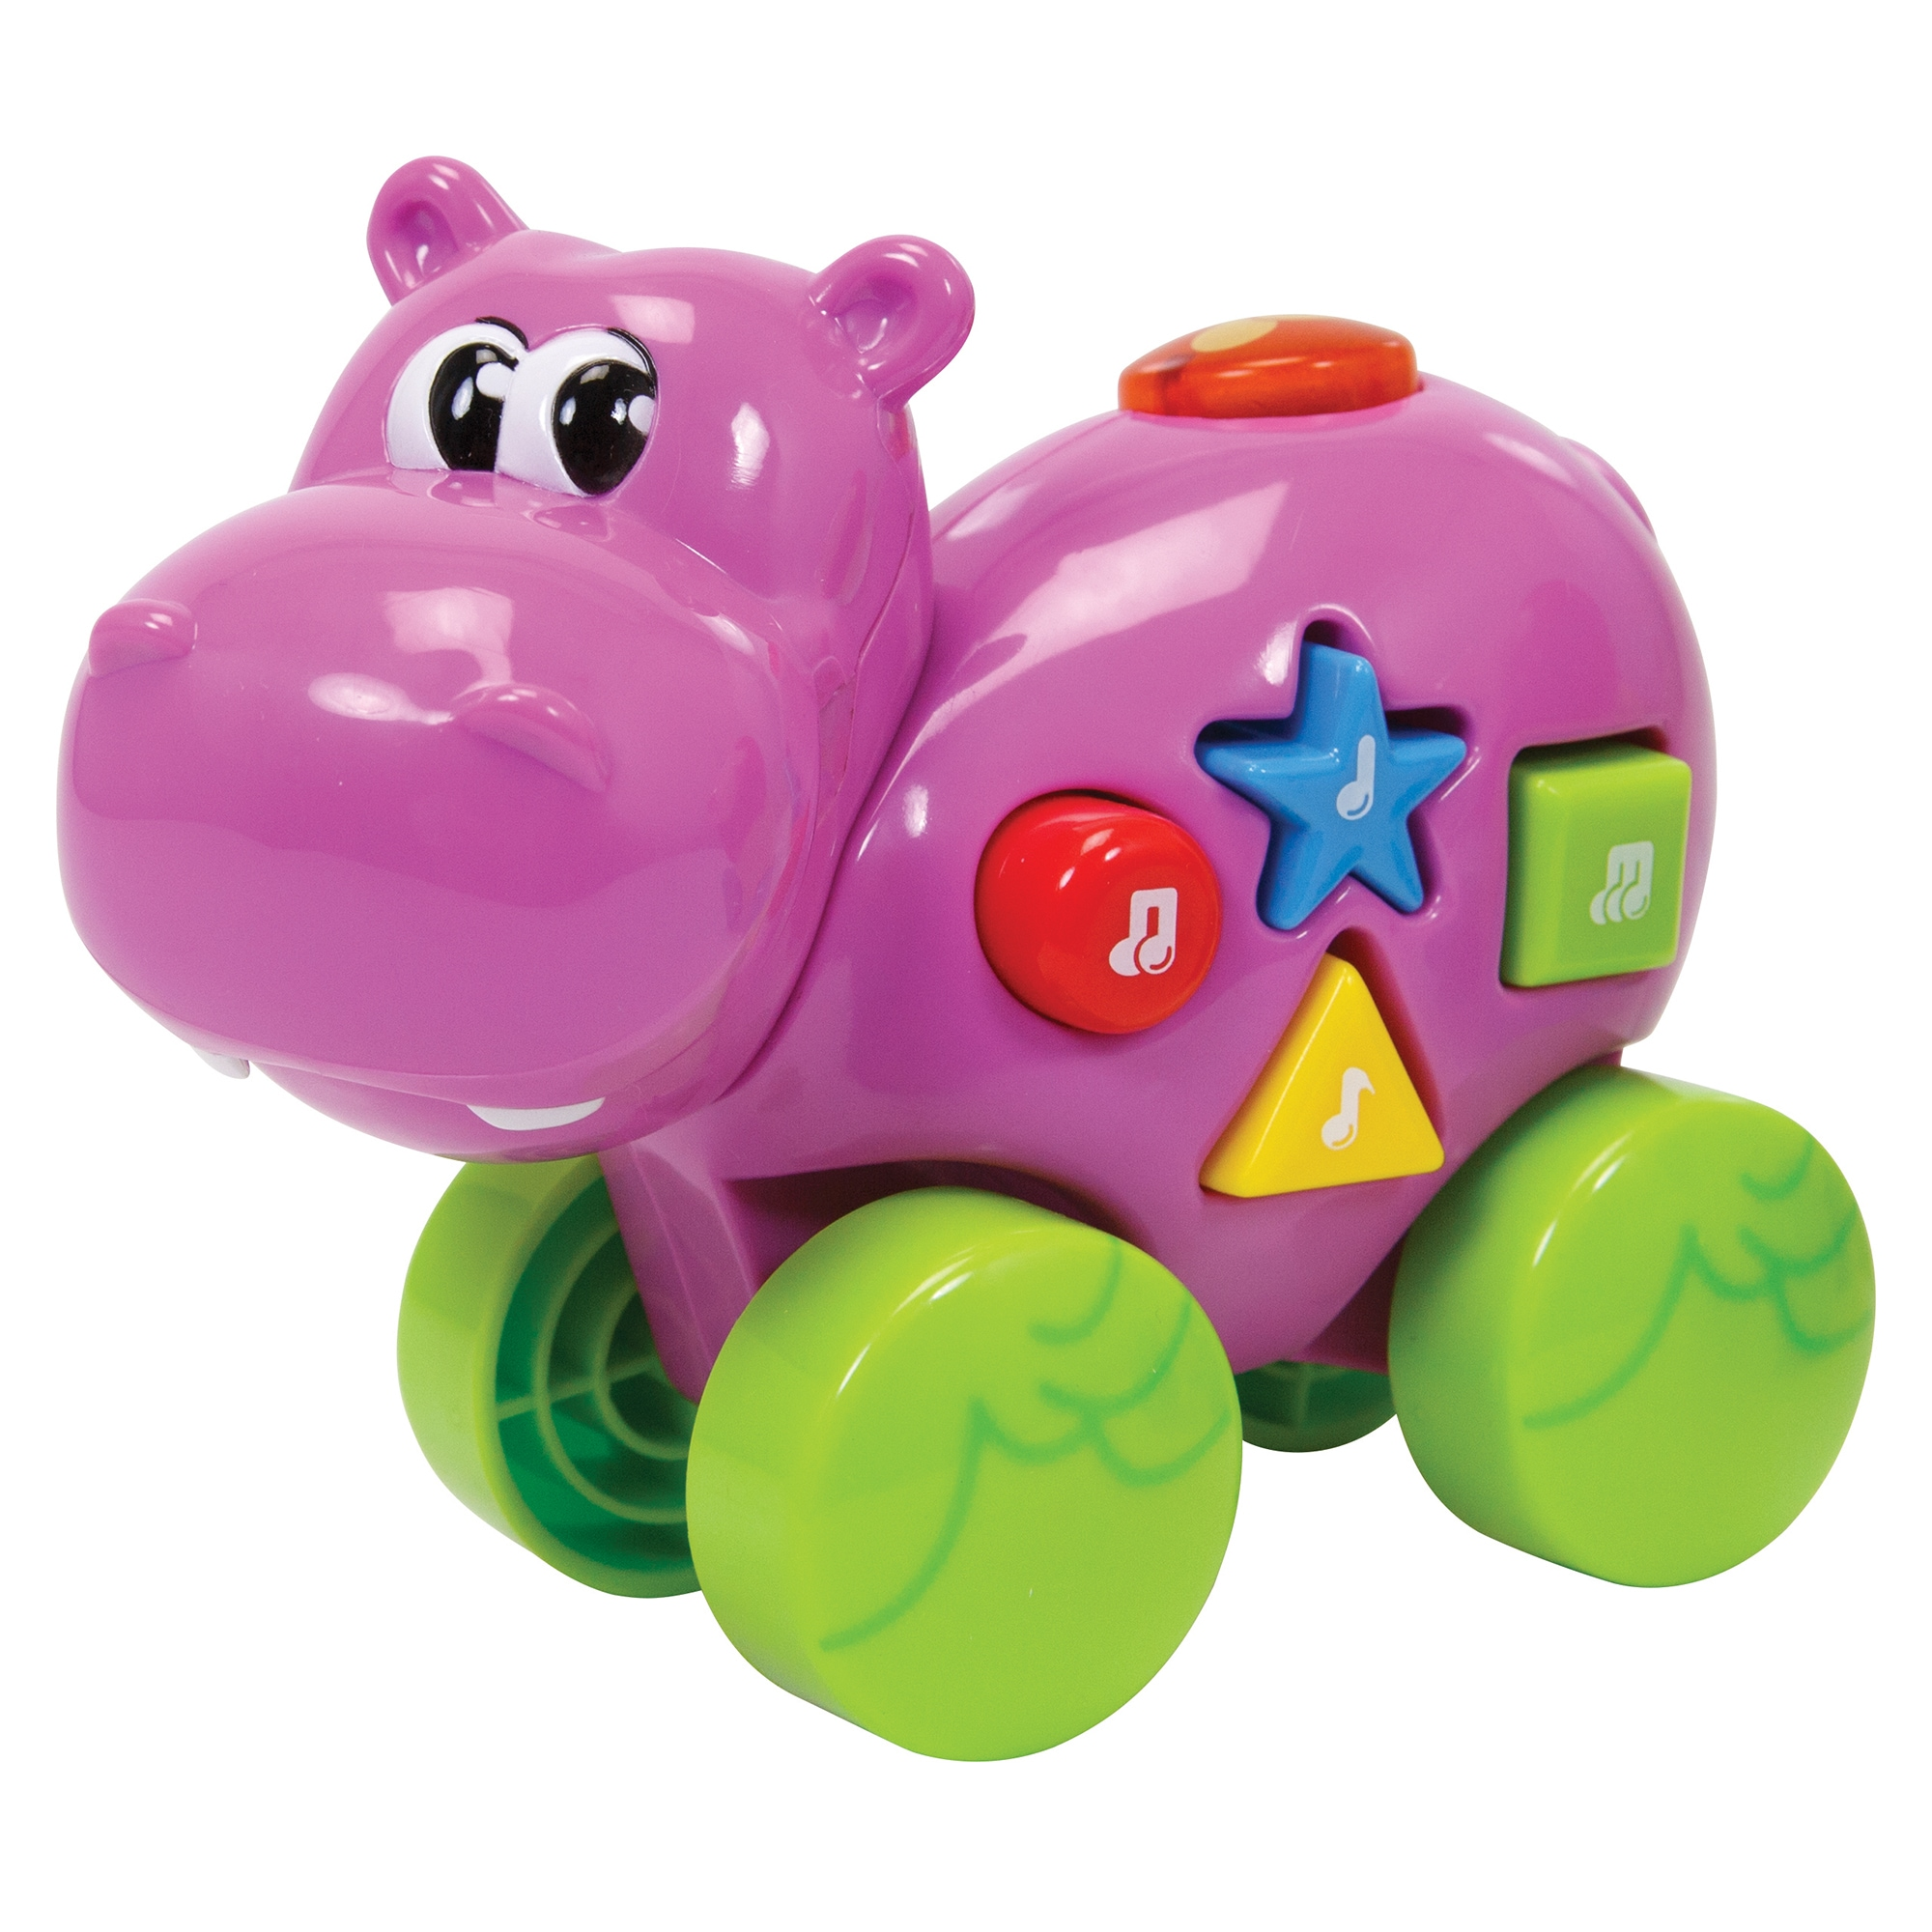 Simba ABC Musical Animals, Hippo by Generic